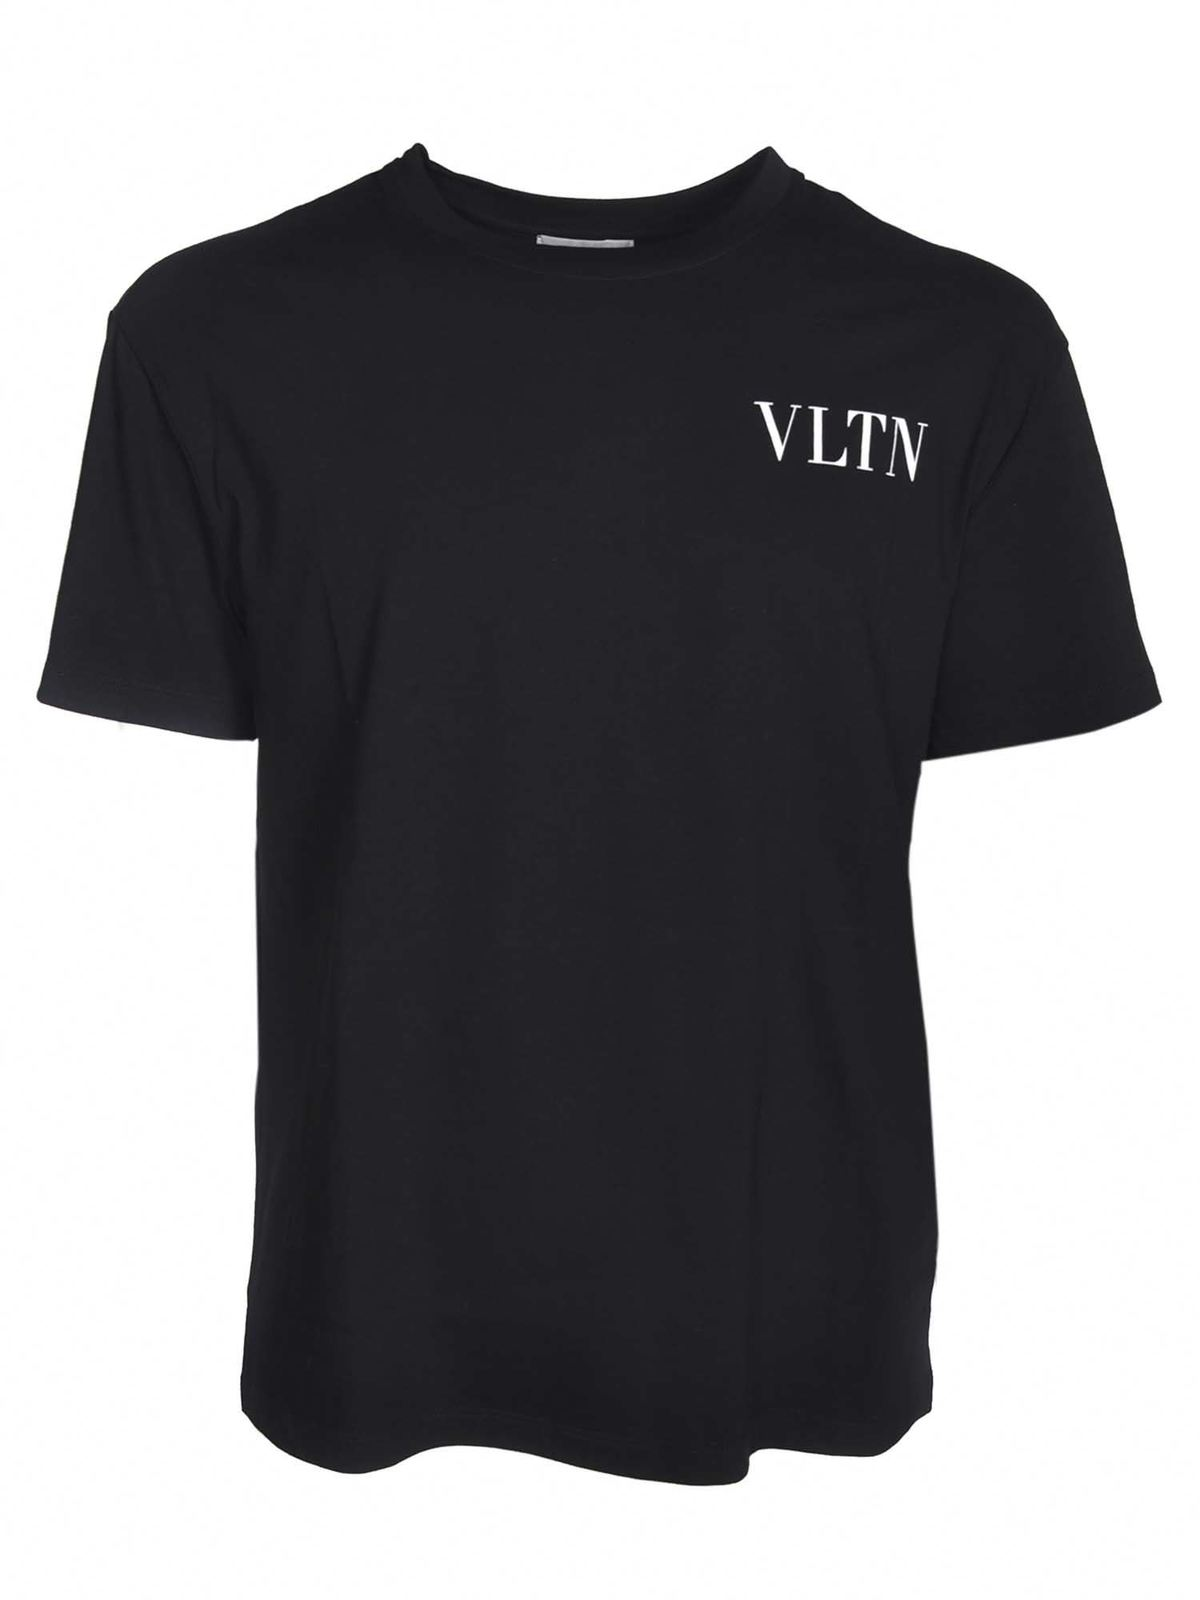 Valentino LOGO T-SHIRT IN BLACK